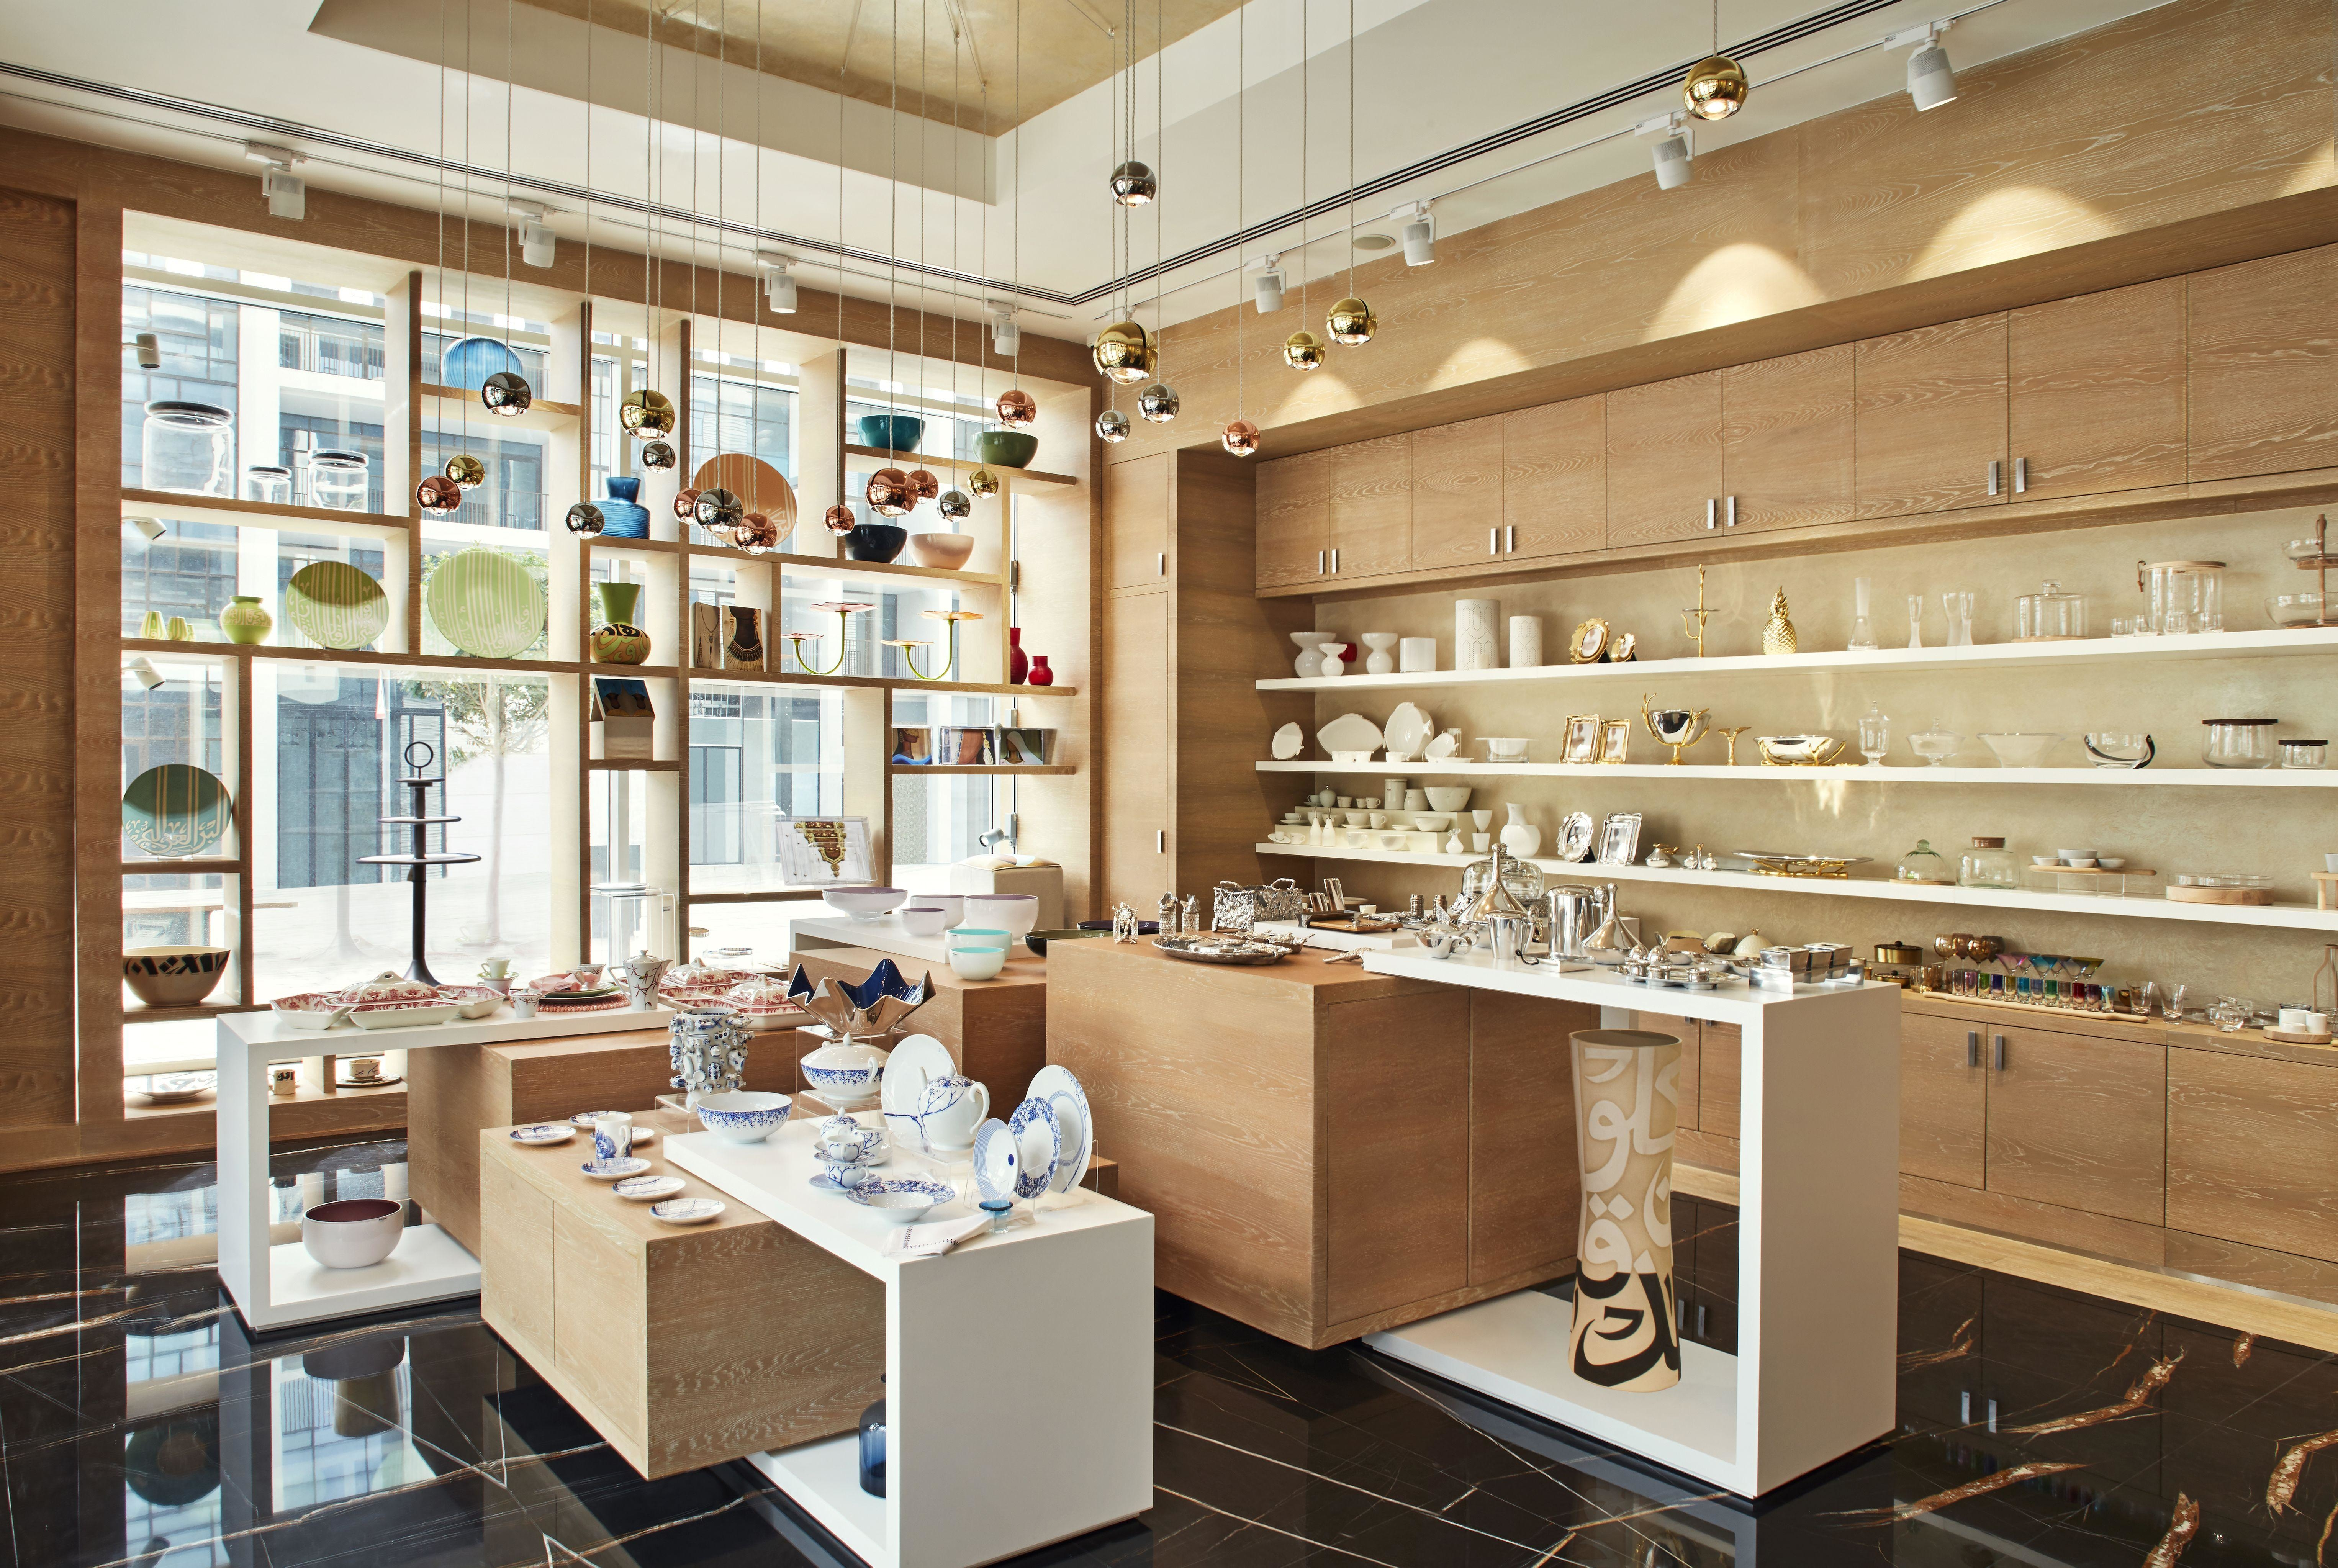 Home Decor Brand Bits&Pieces Opens Dubai Boutique